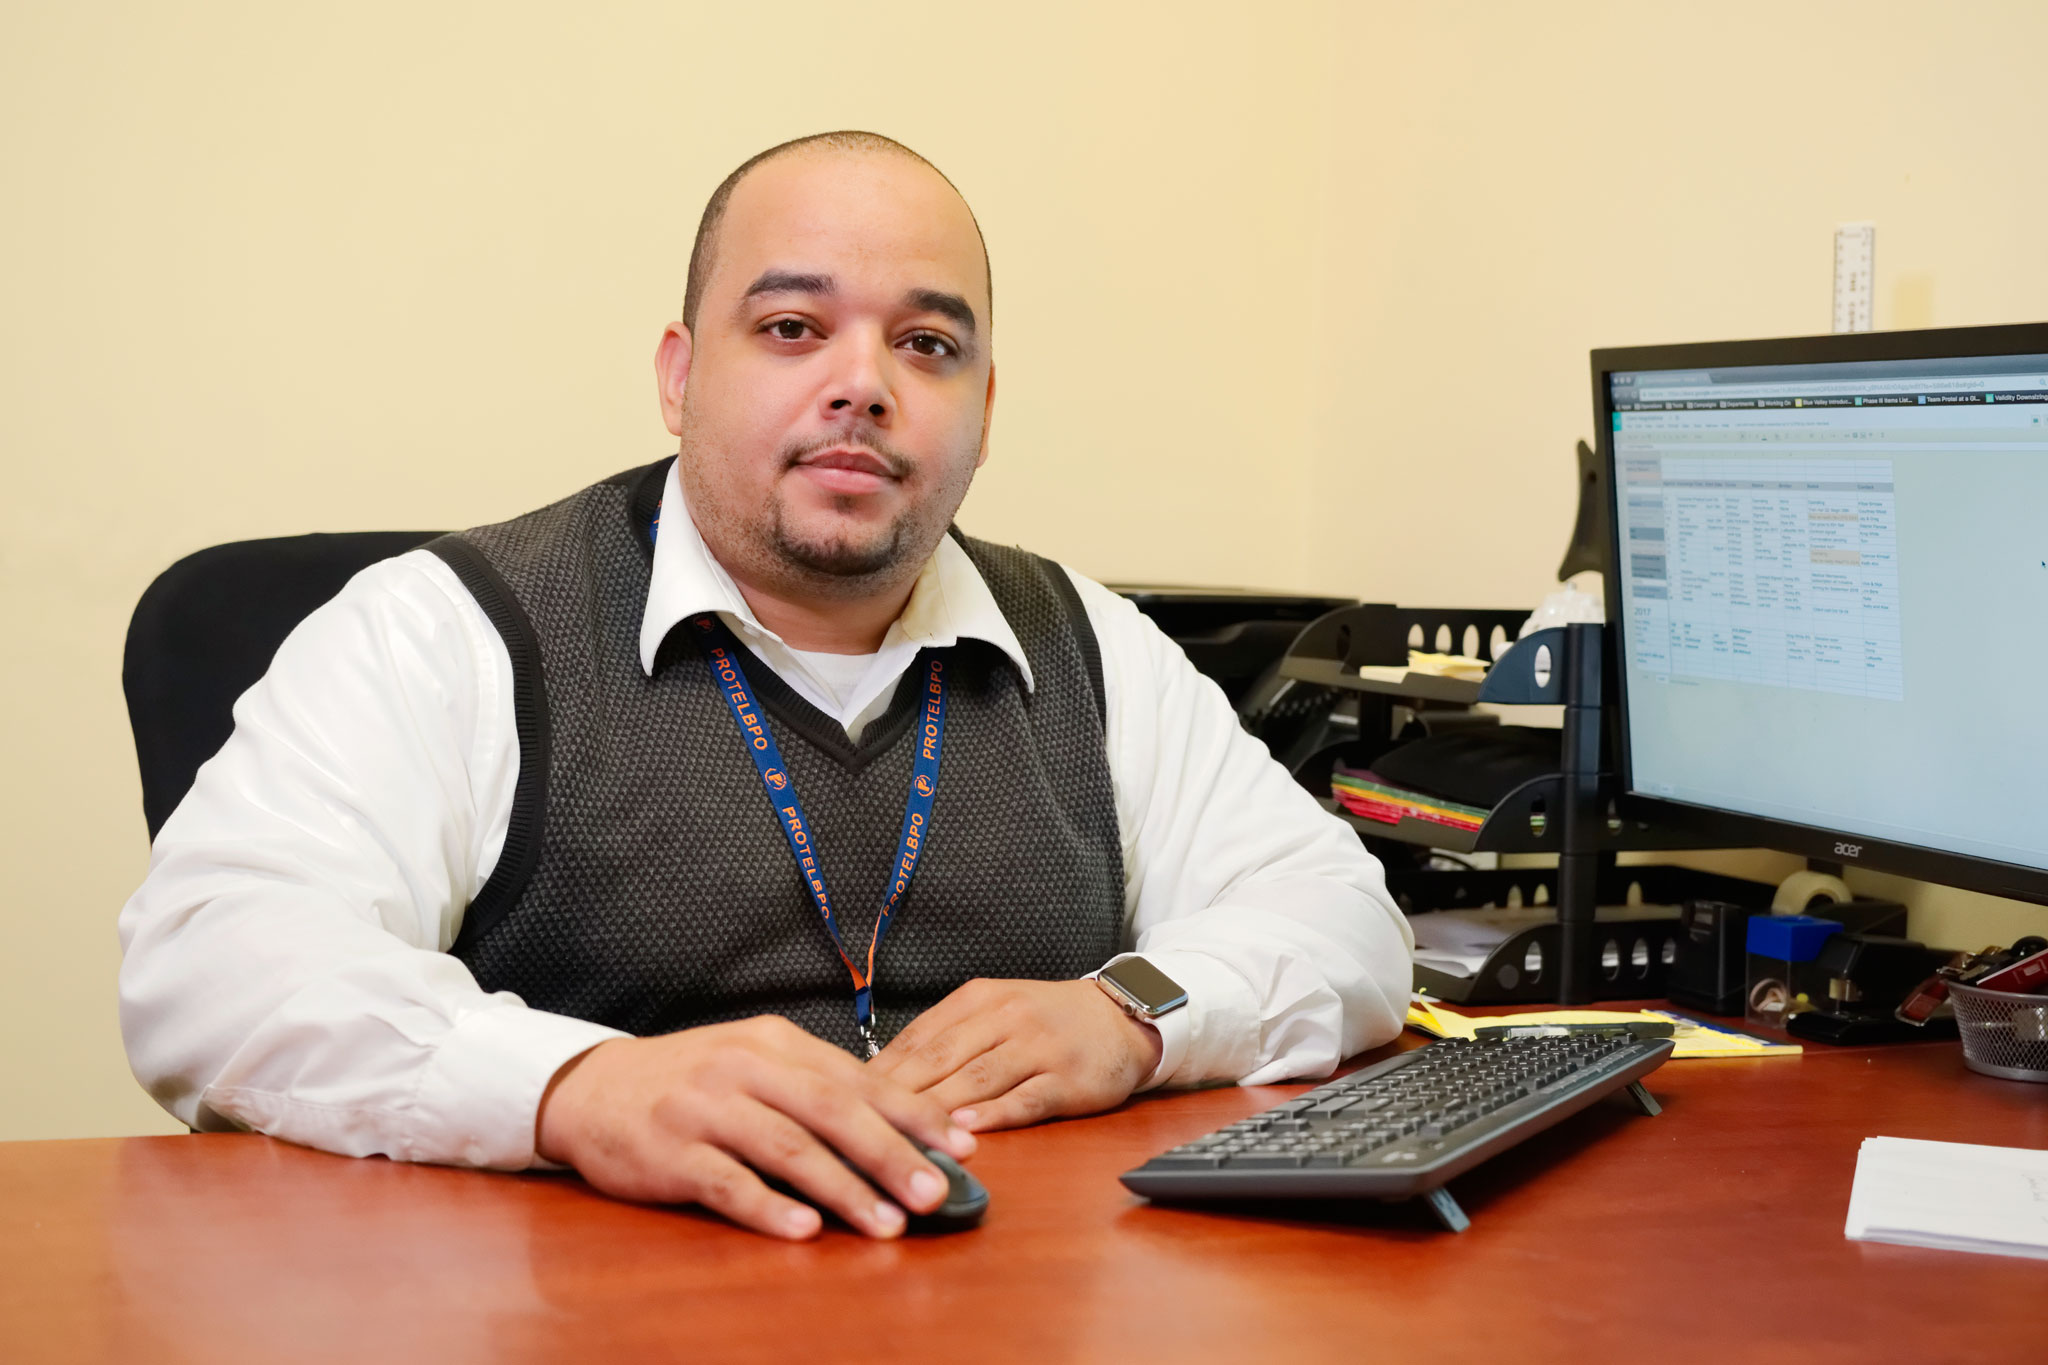 Protel BPO's Operations Director Shamir Villanueva ensures Protel BPO delivers a stellar experience to each client's customers.